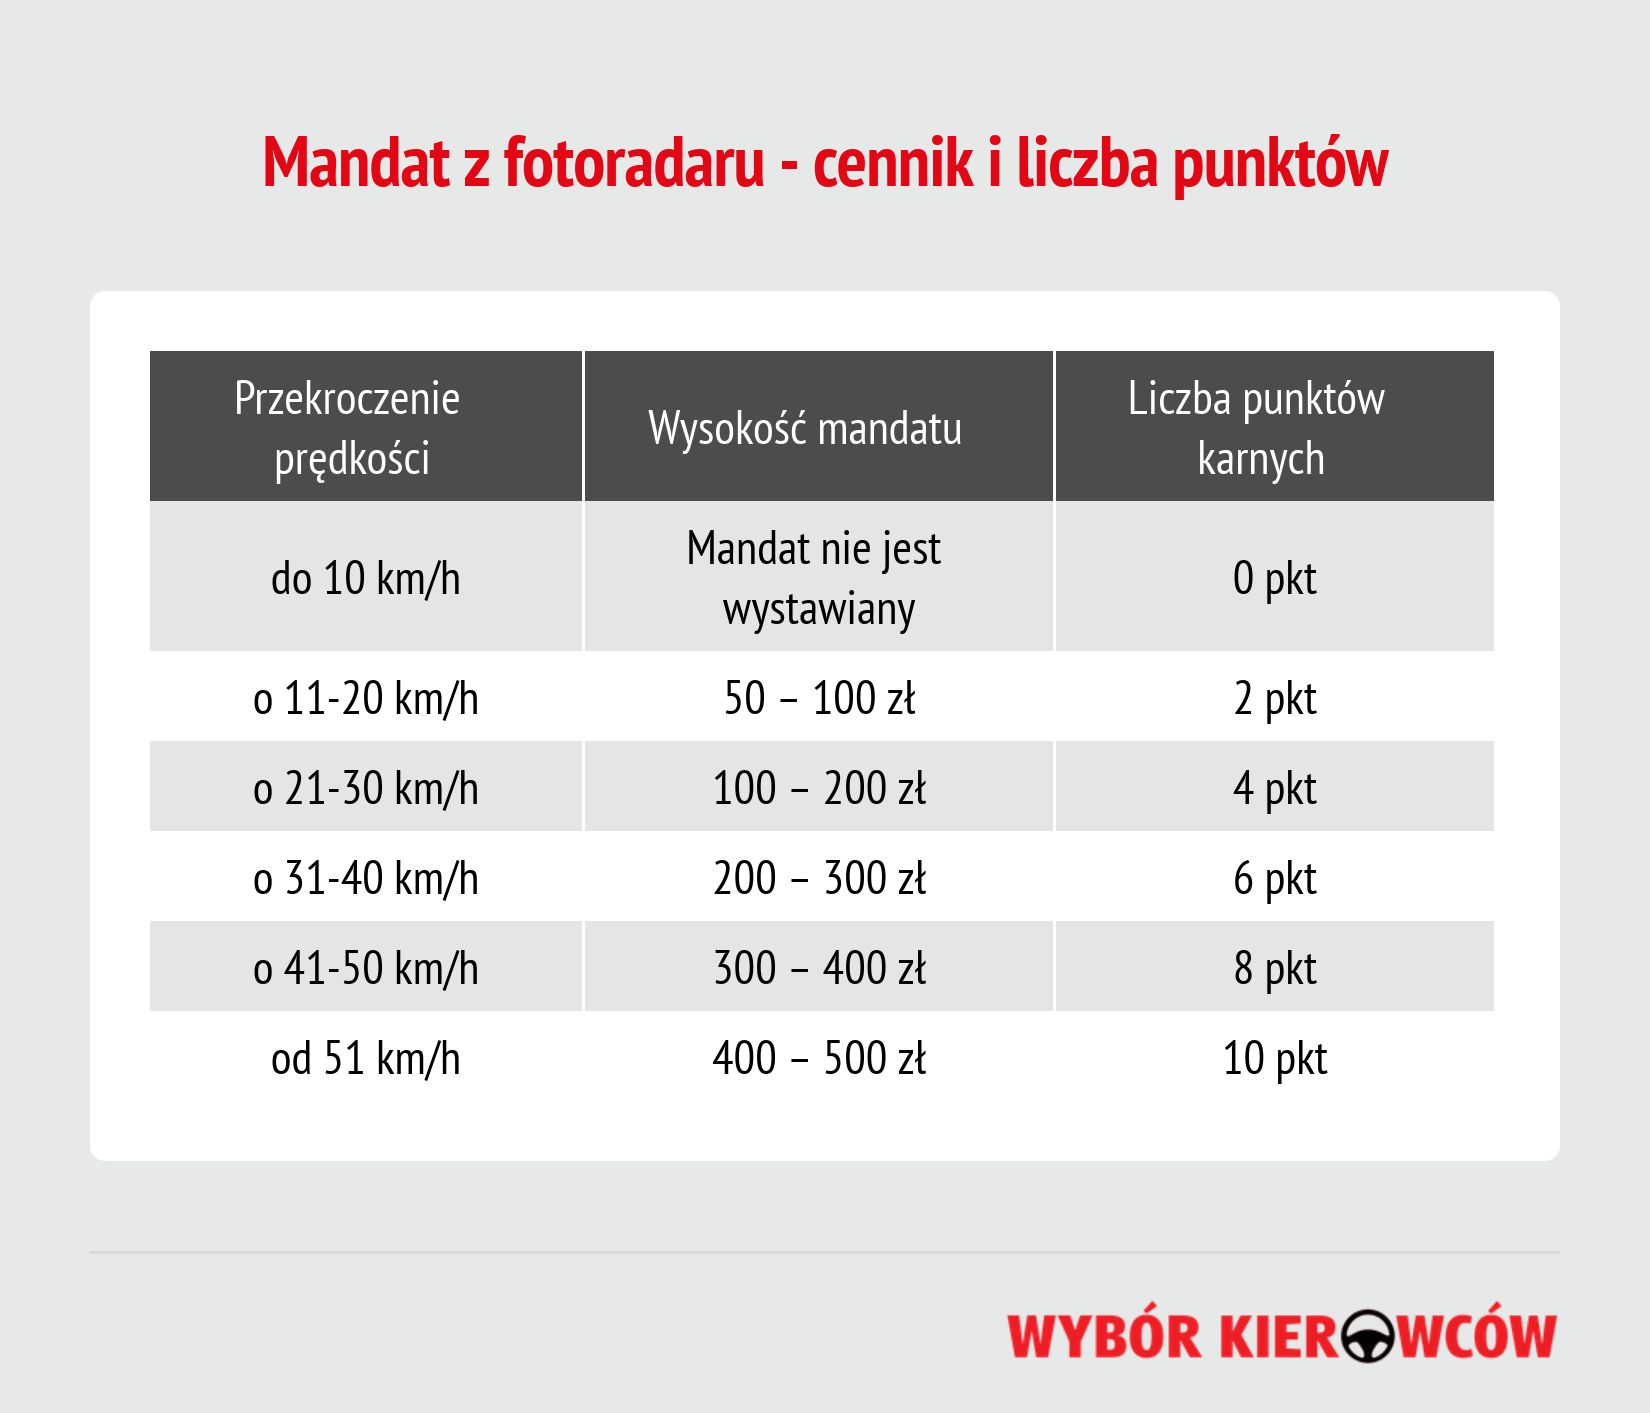 mandat z fotoradaru cennik i liczba punktow